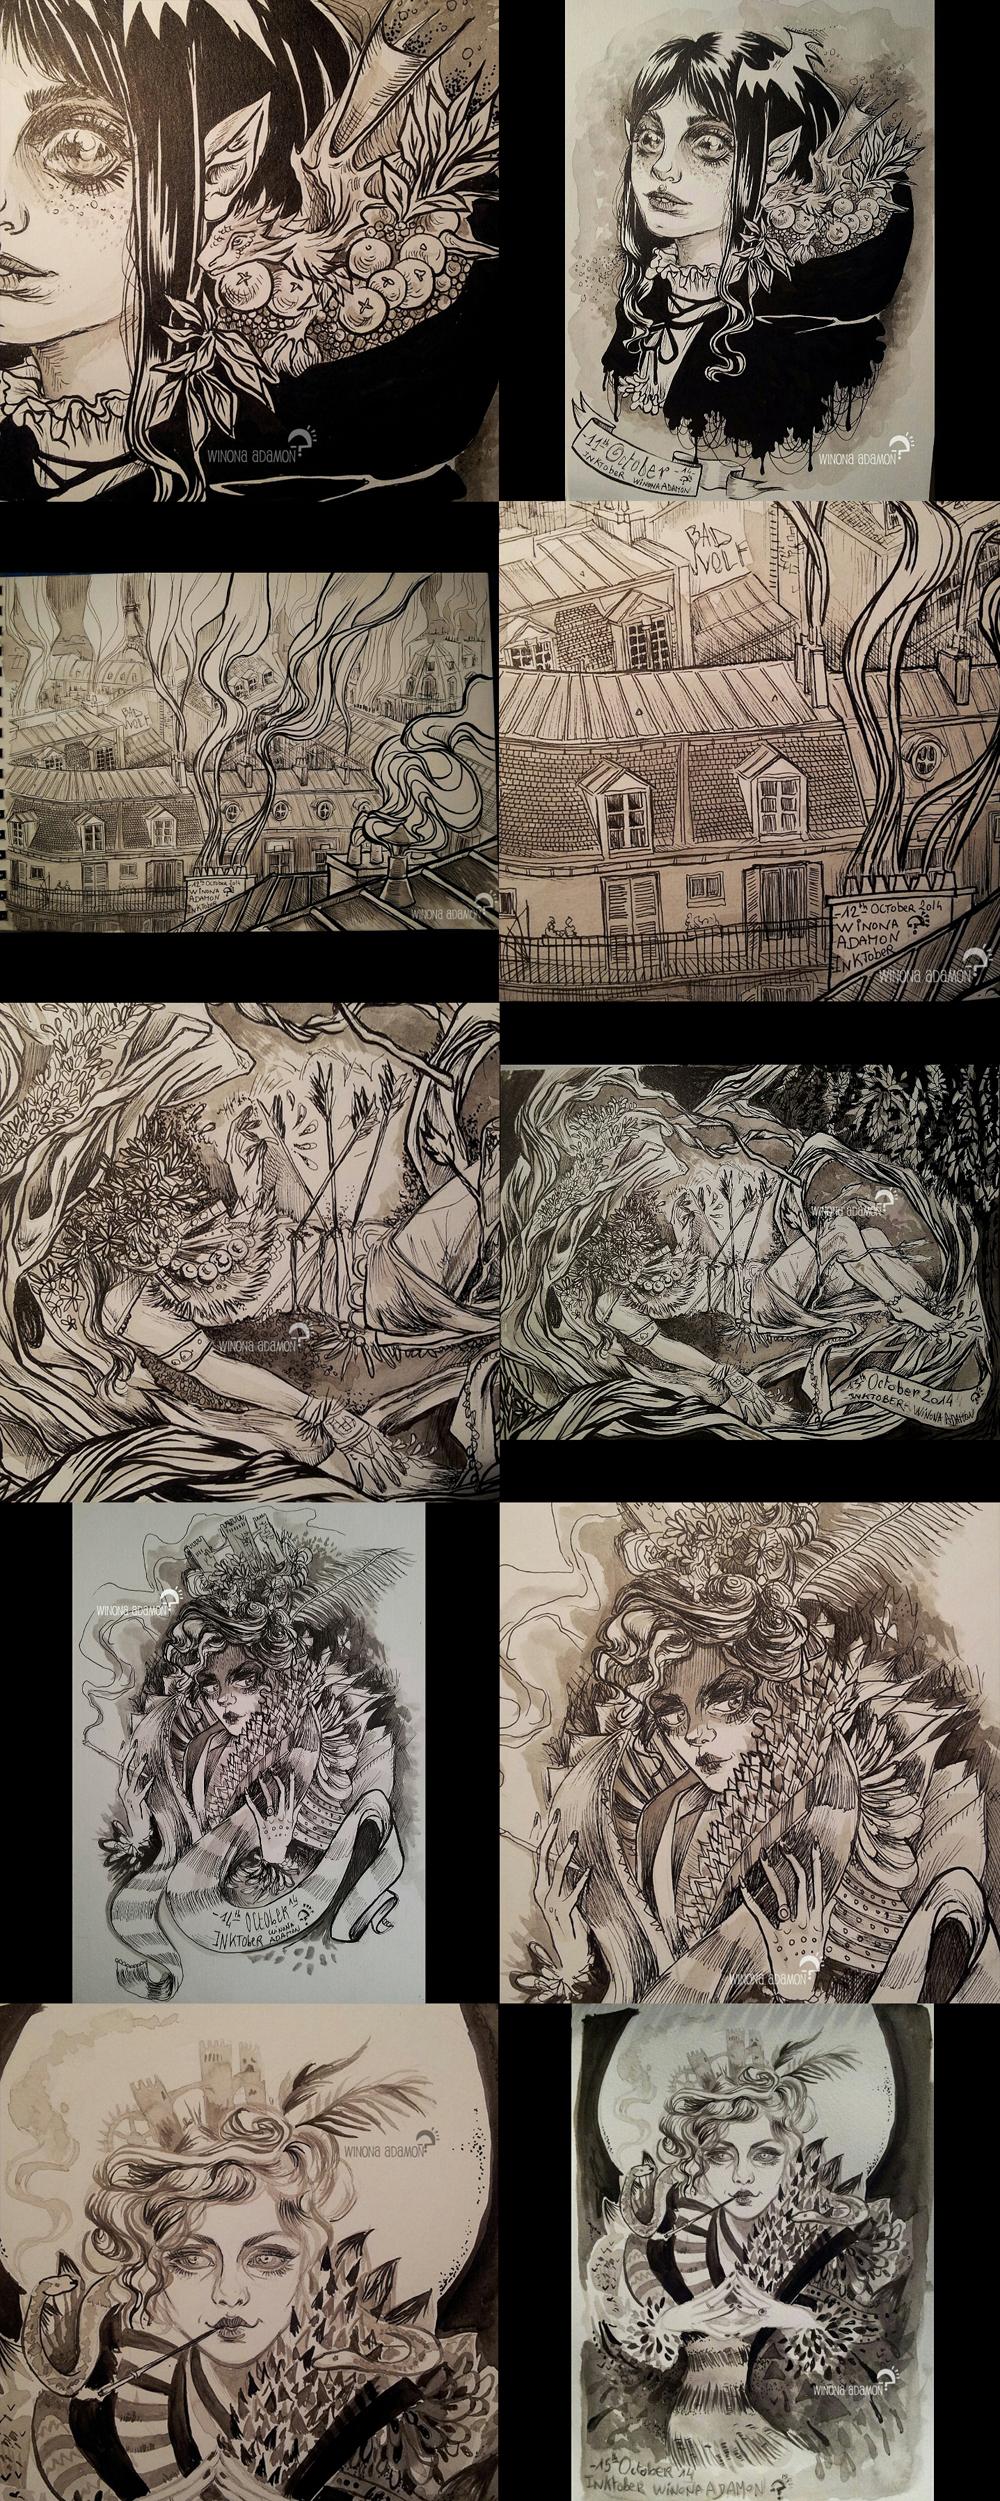 INKtober 2014 11-15 by winona-adamon